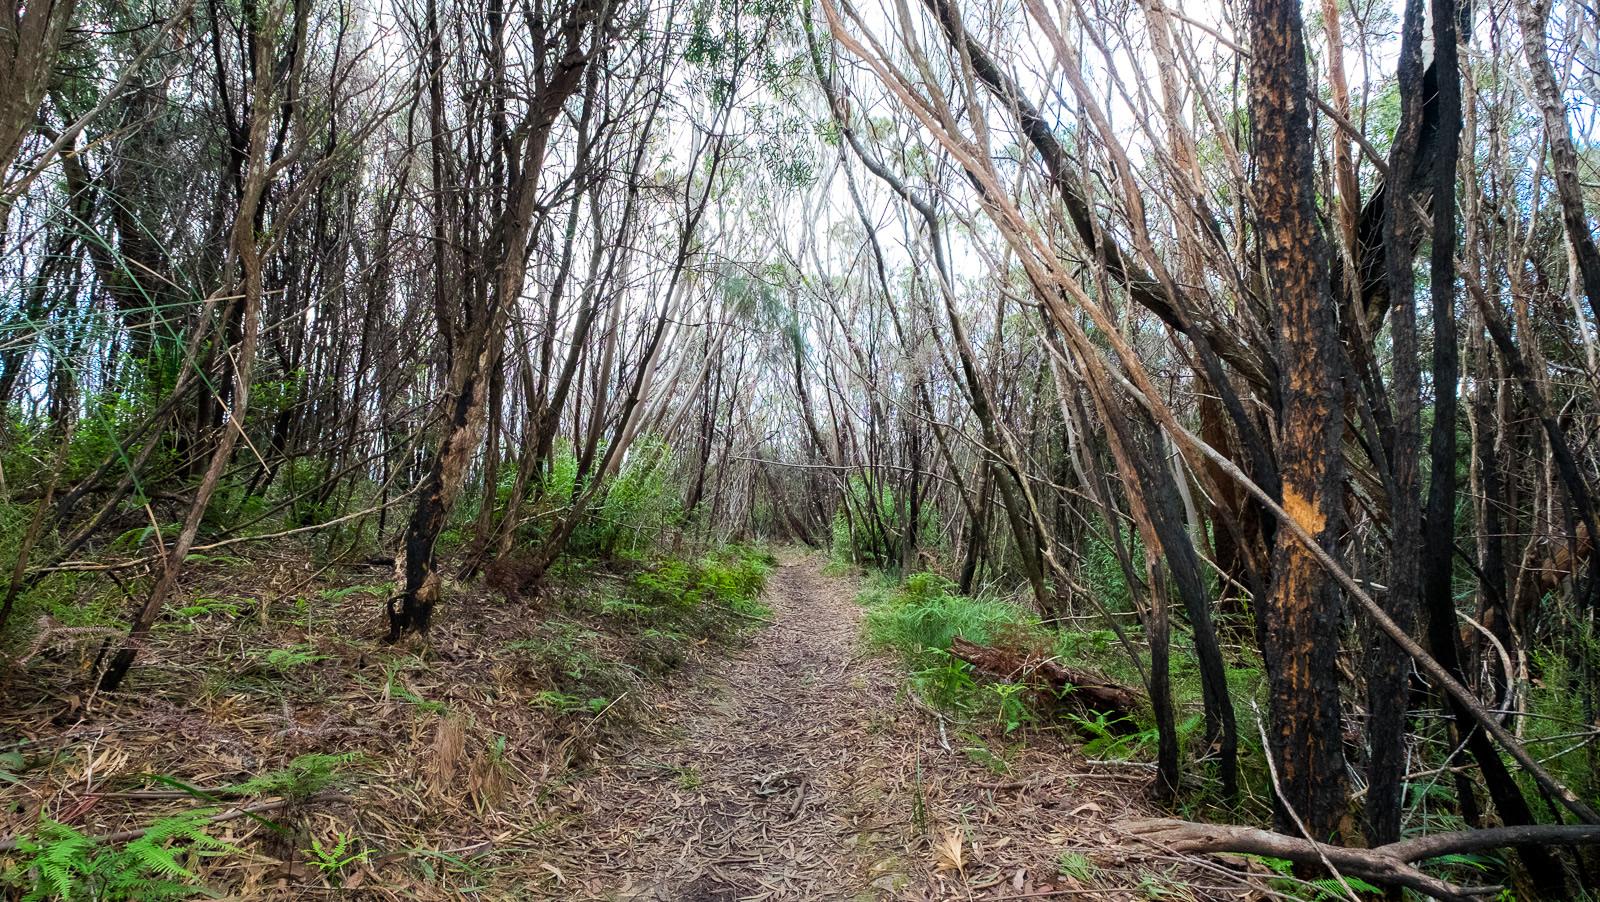 Mallee-Lamington-National-Park-Binna-Burra-Gold-Coast-bushwalking-hiking